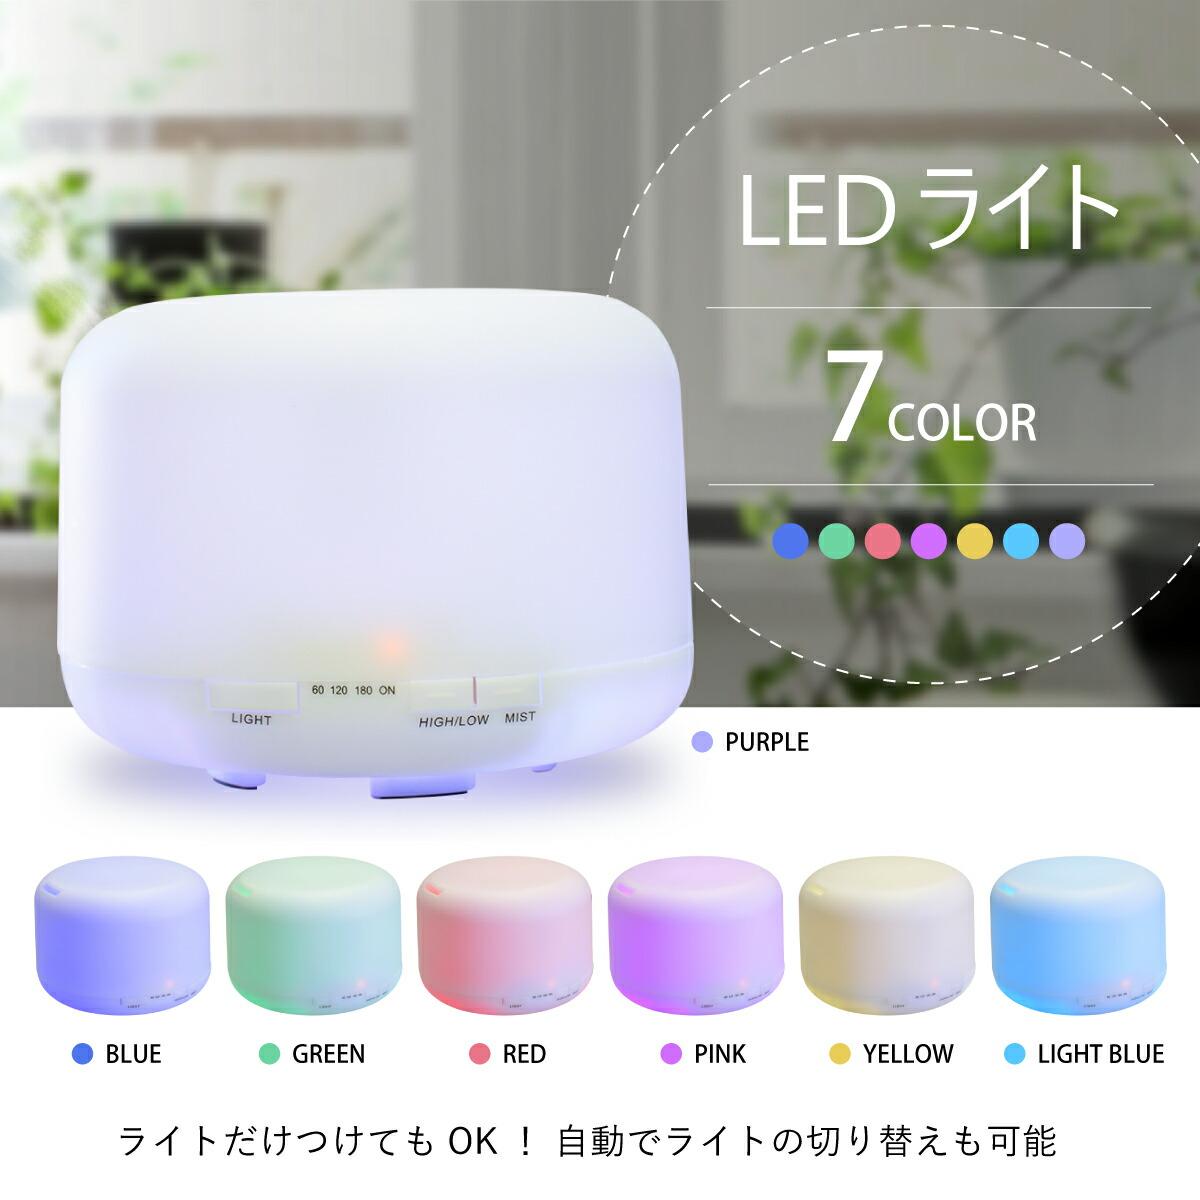 LEDライトは7色あり、明るさは2段階変化。ライトのみの点灯もOK